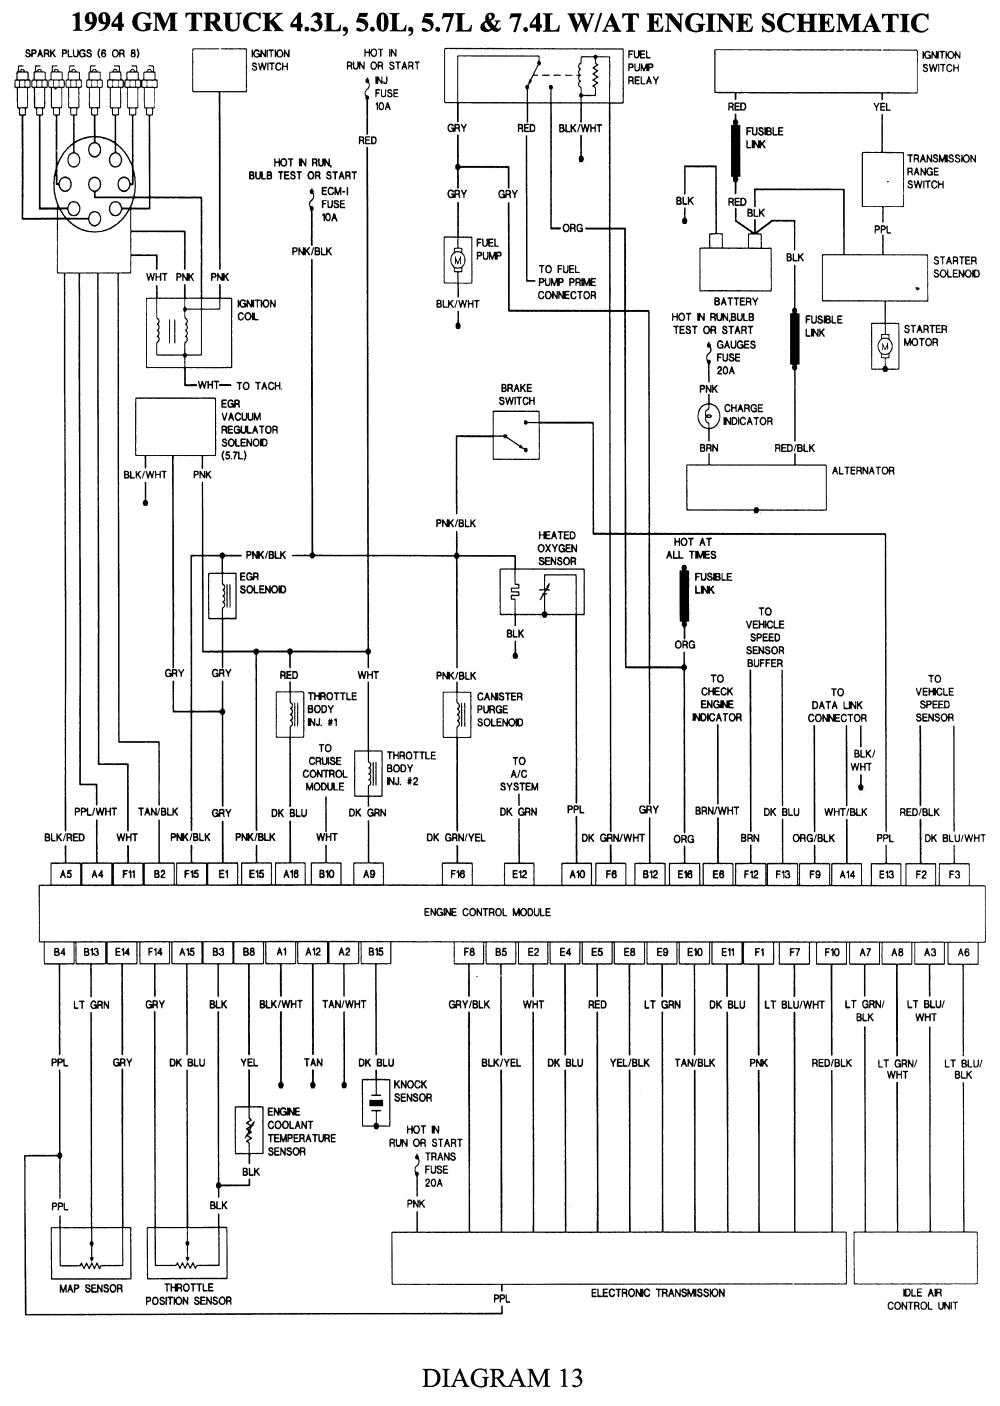 1994 chevy truck brake light wiring diagram luxury repair guides wiring diagrams wiring diagrams of 1994 chevy truck brake light wiring diagram gif